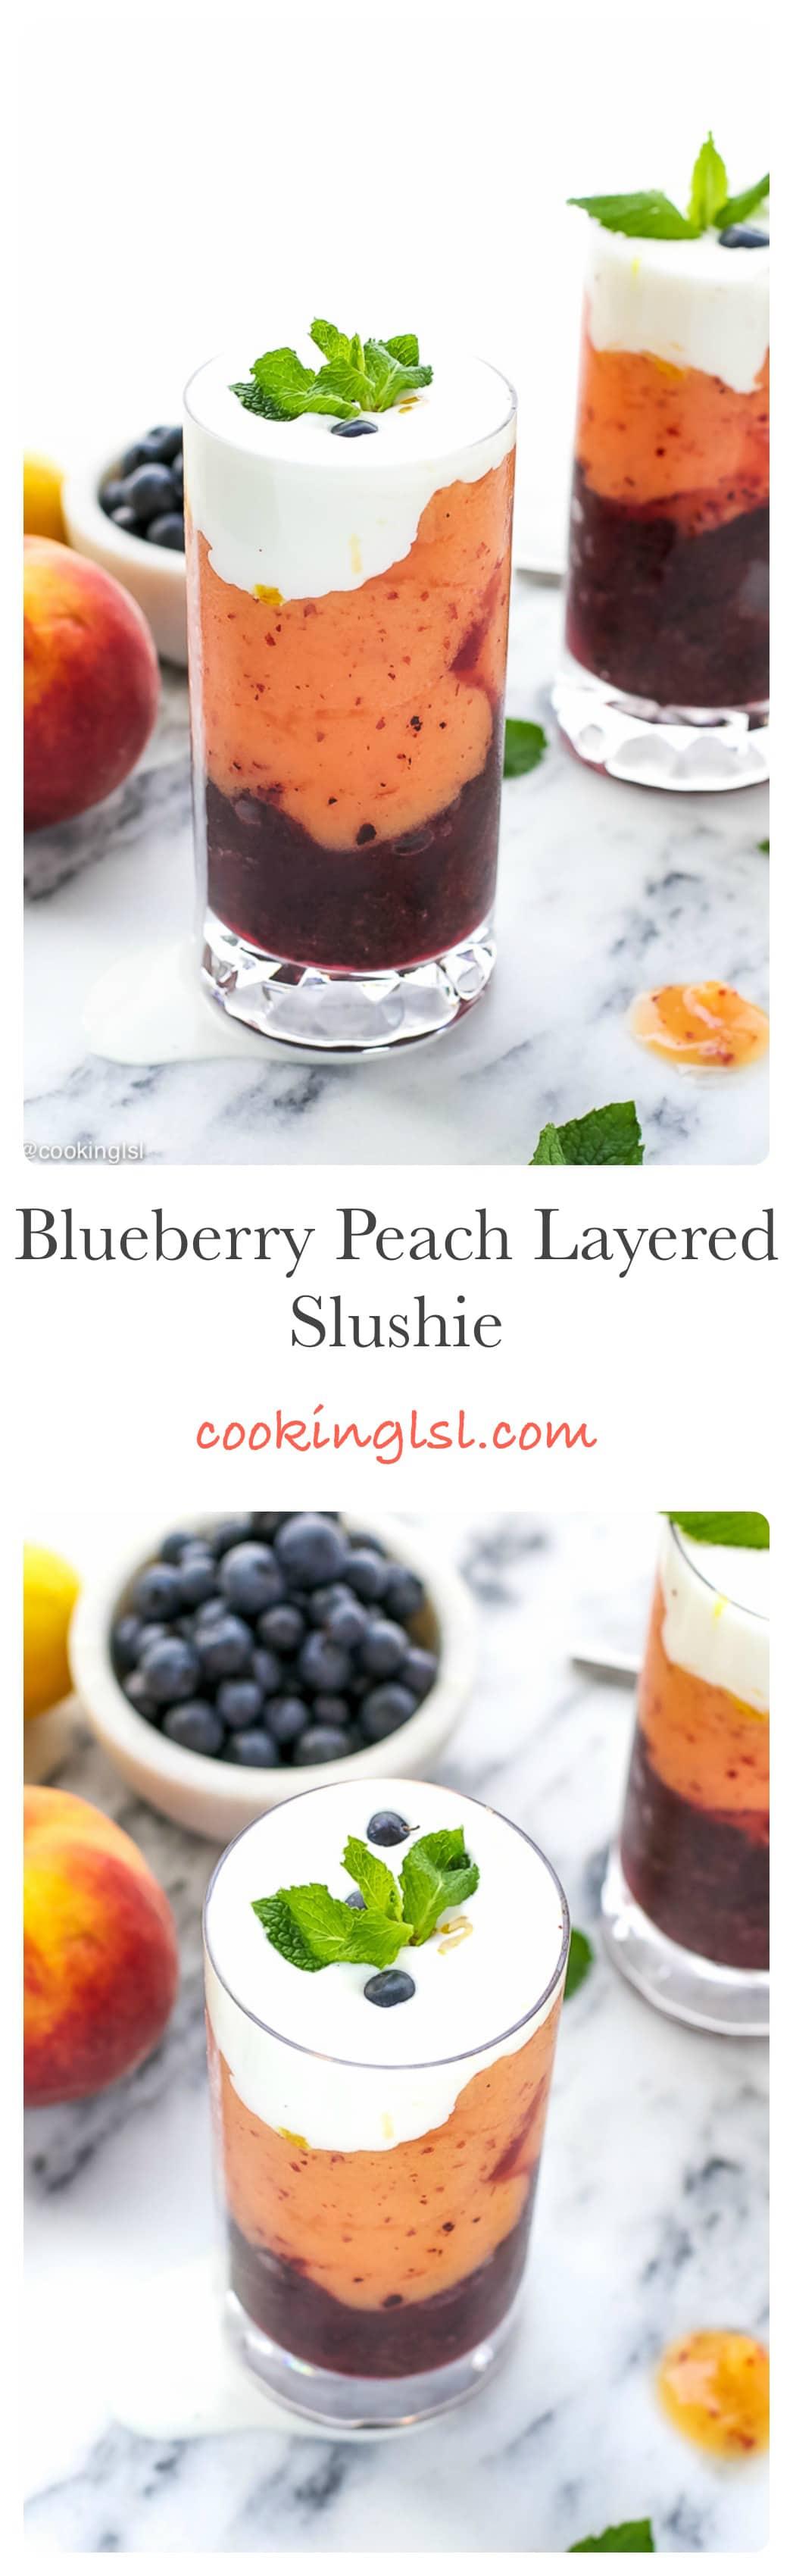 Blueberry-Peach-Layered-Slushie-Recipe